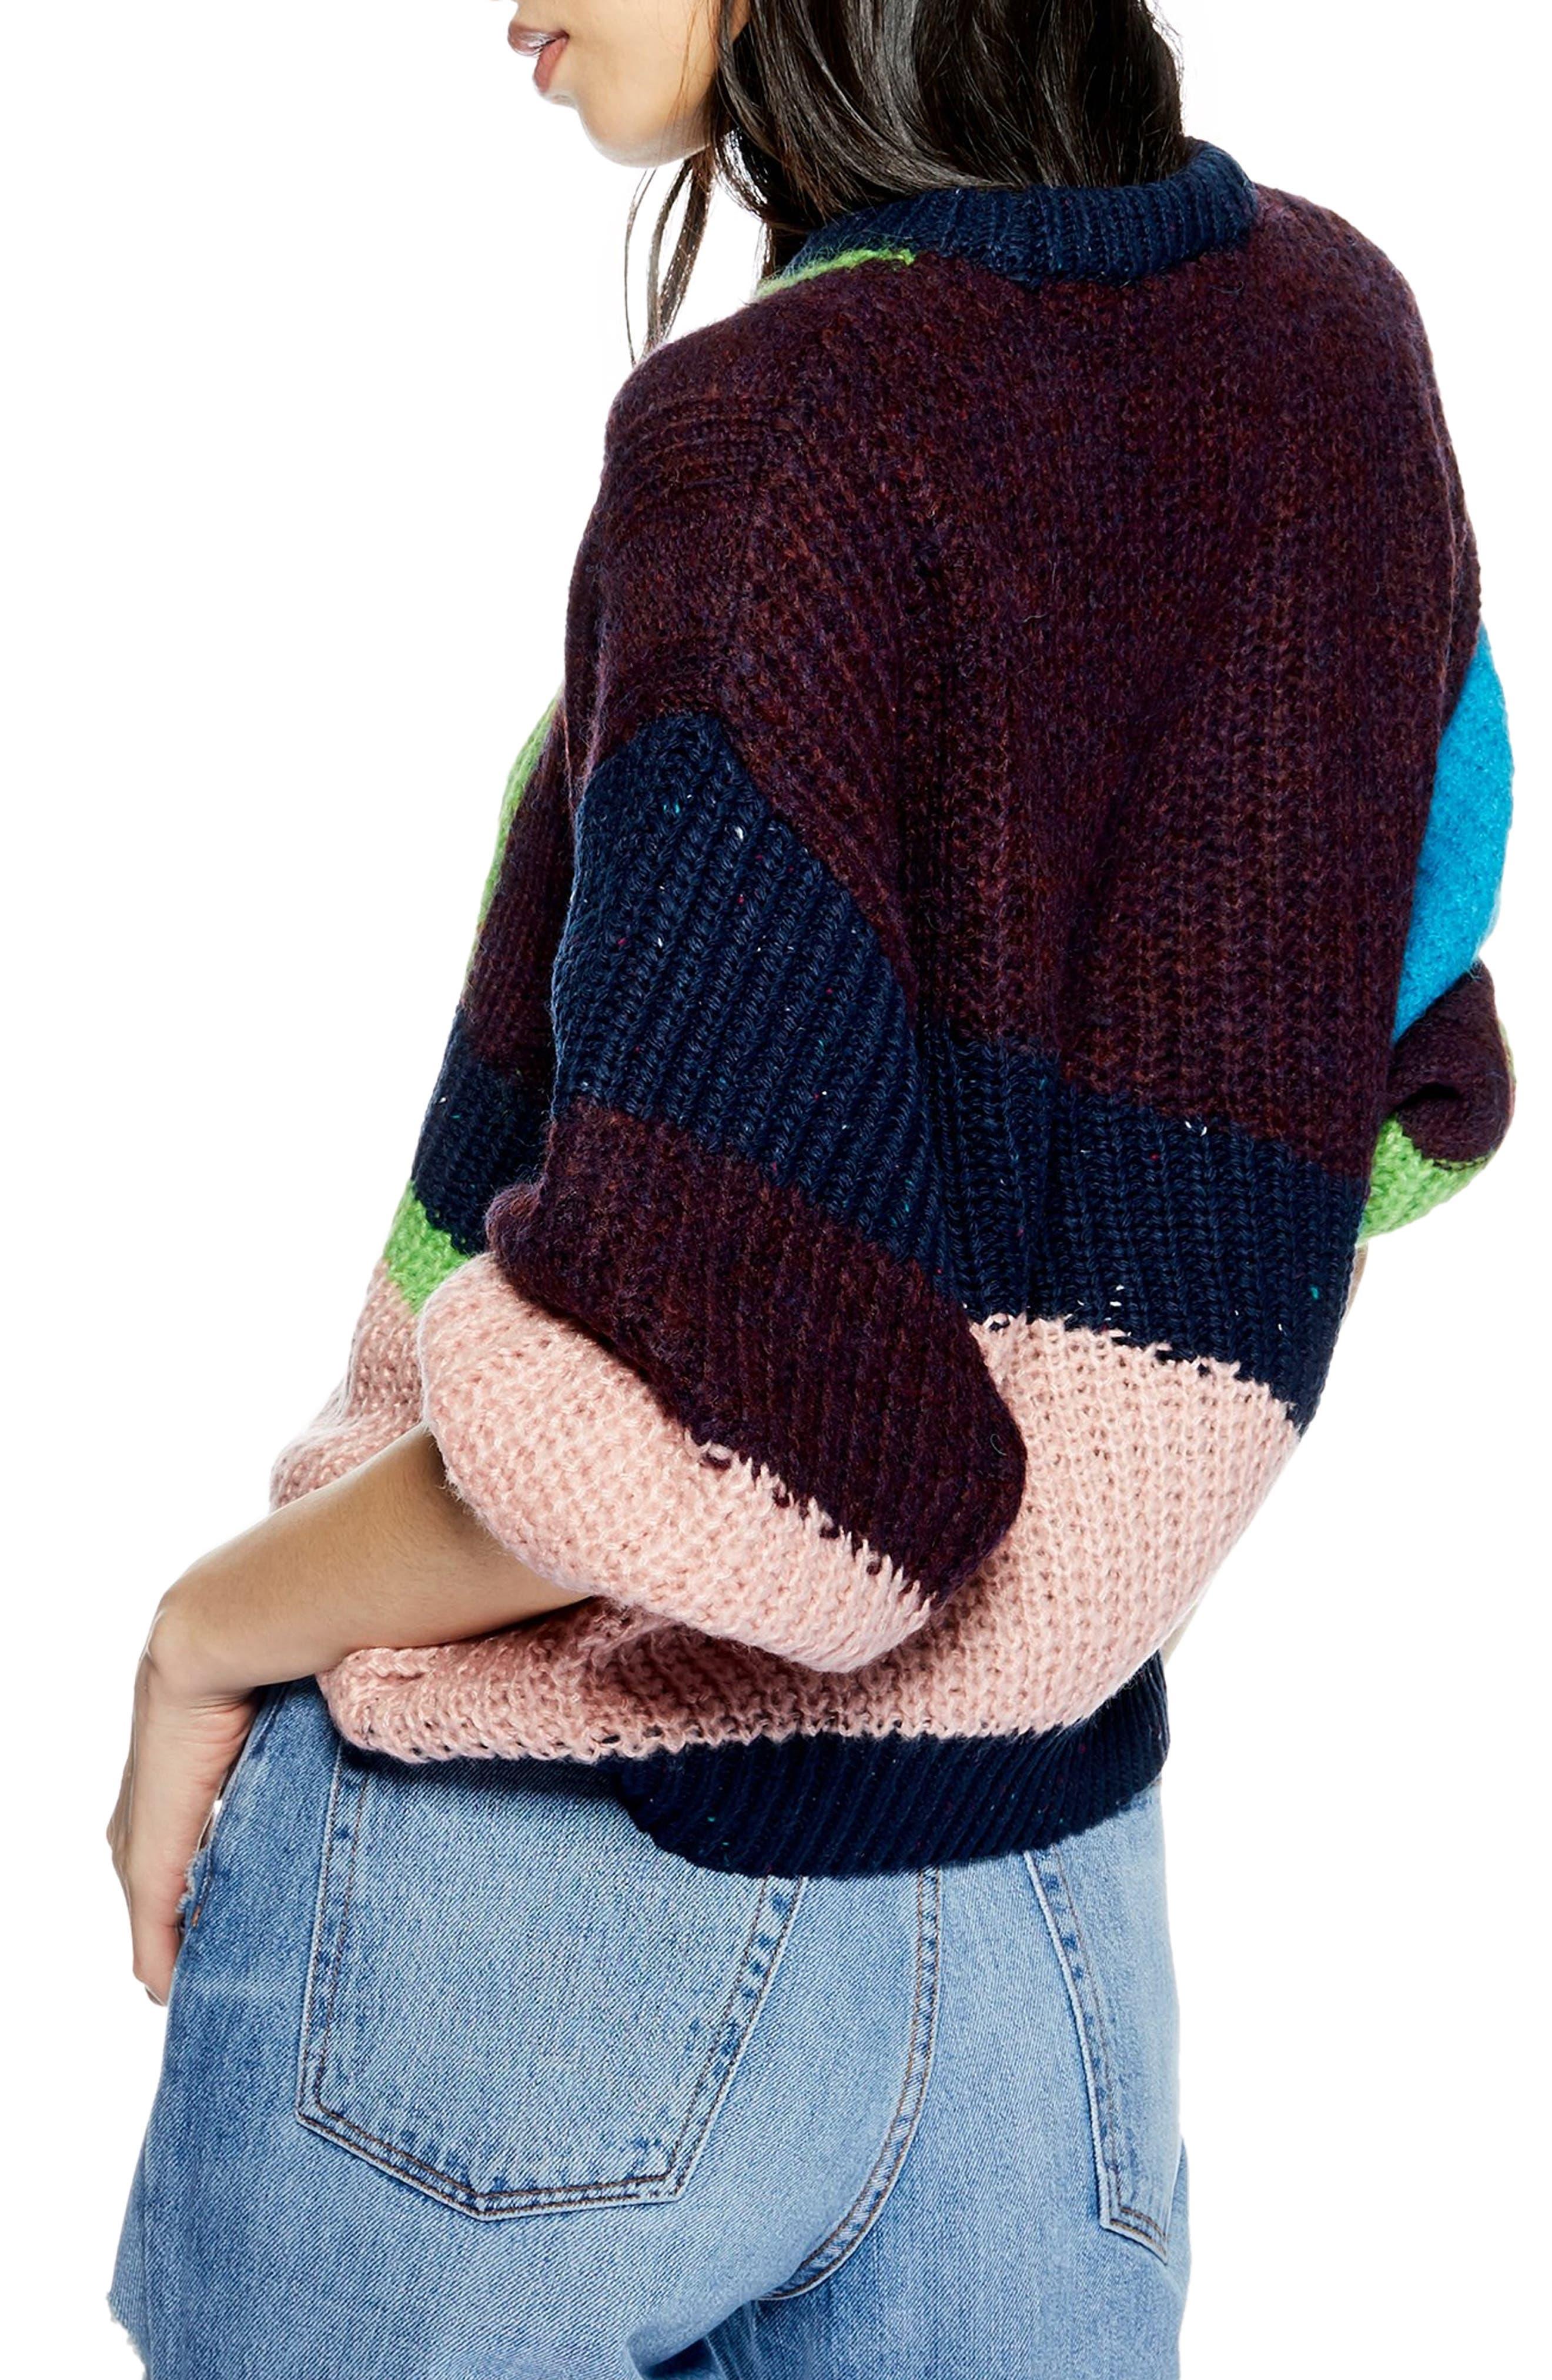 TOPSHOP,                             Colorblock Sweater,                             Alternate thumbnail 2, color,                             002